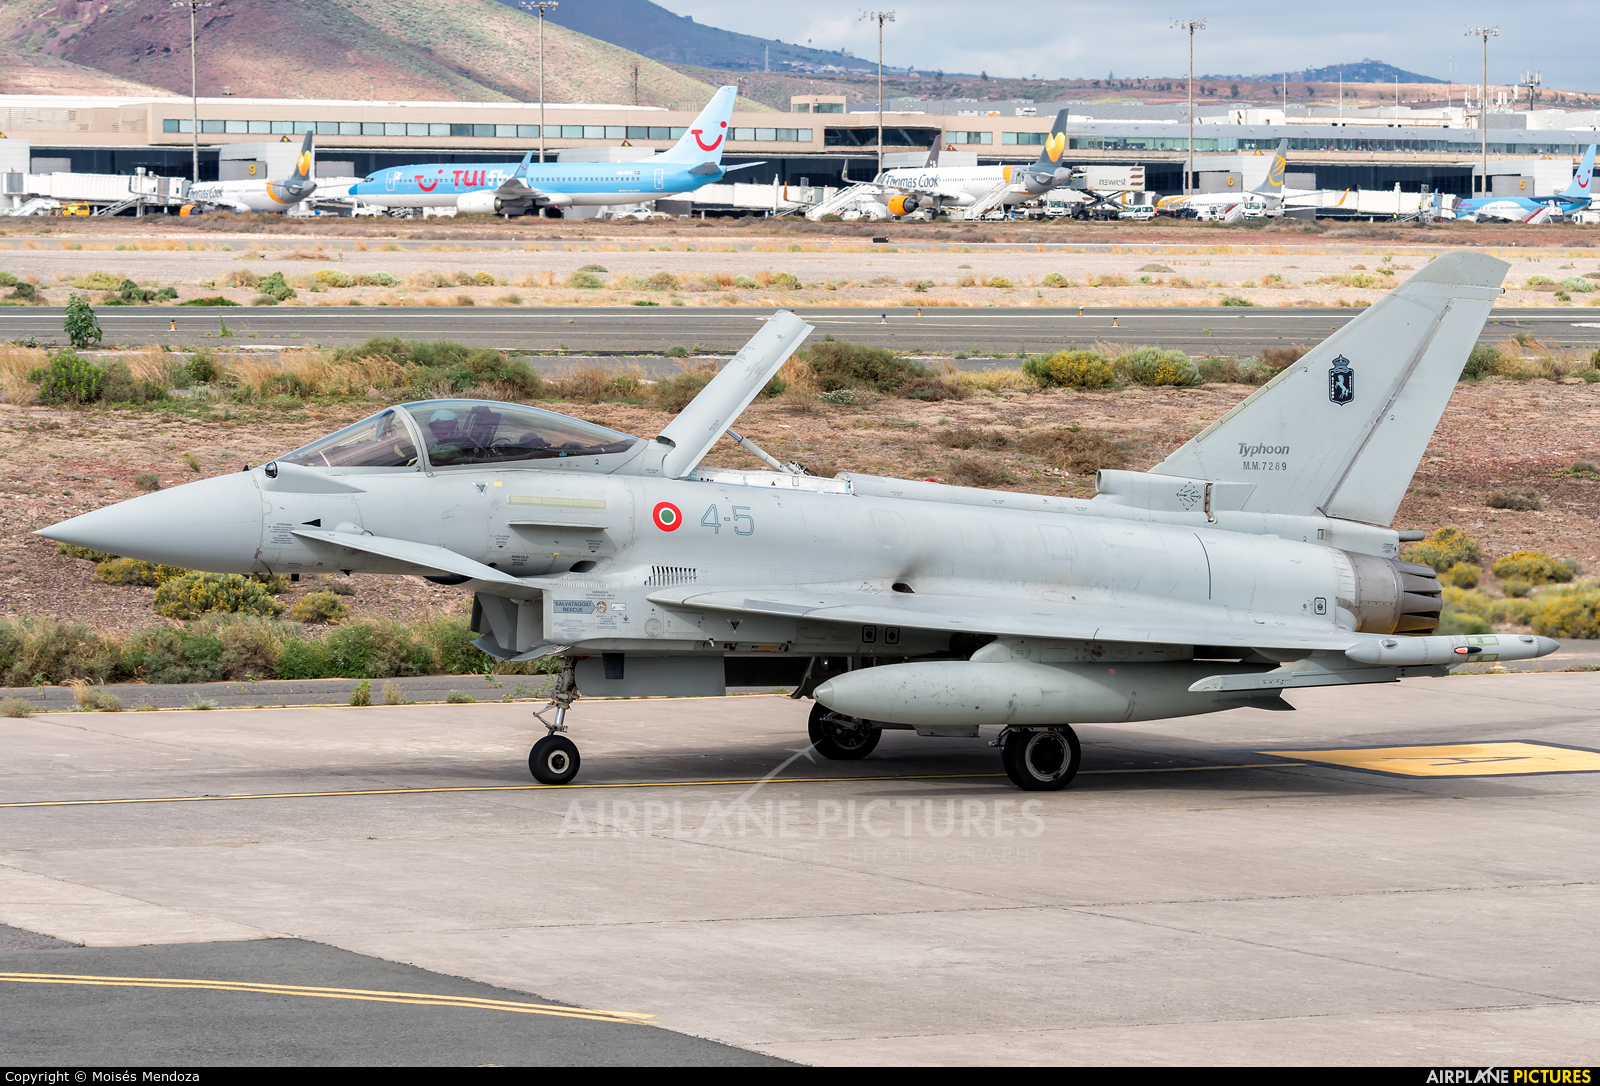 Italy - Air Force MM7289 aircraft at Aeropuerto de Gran Canaria